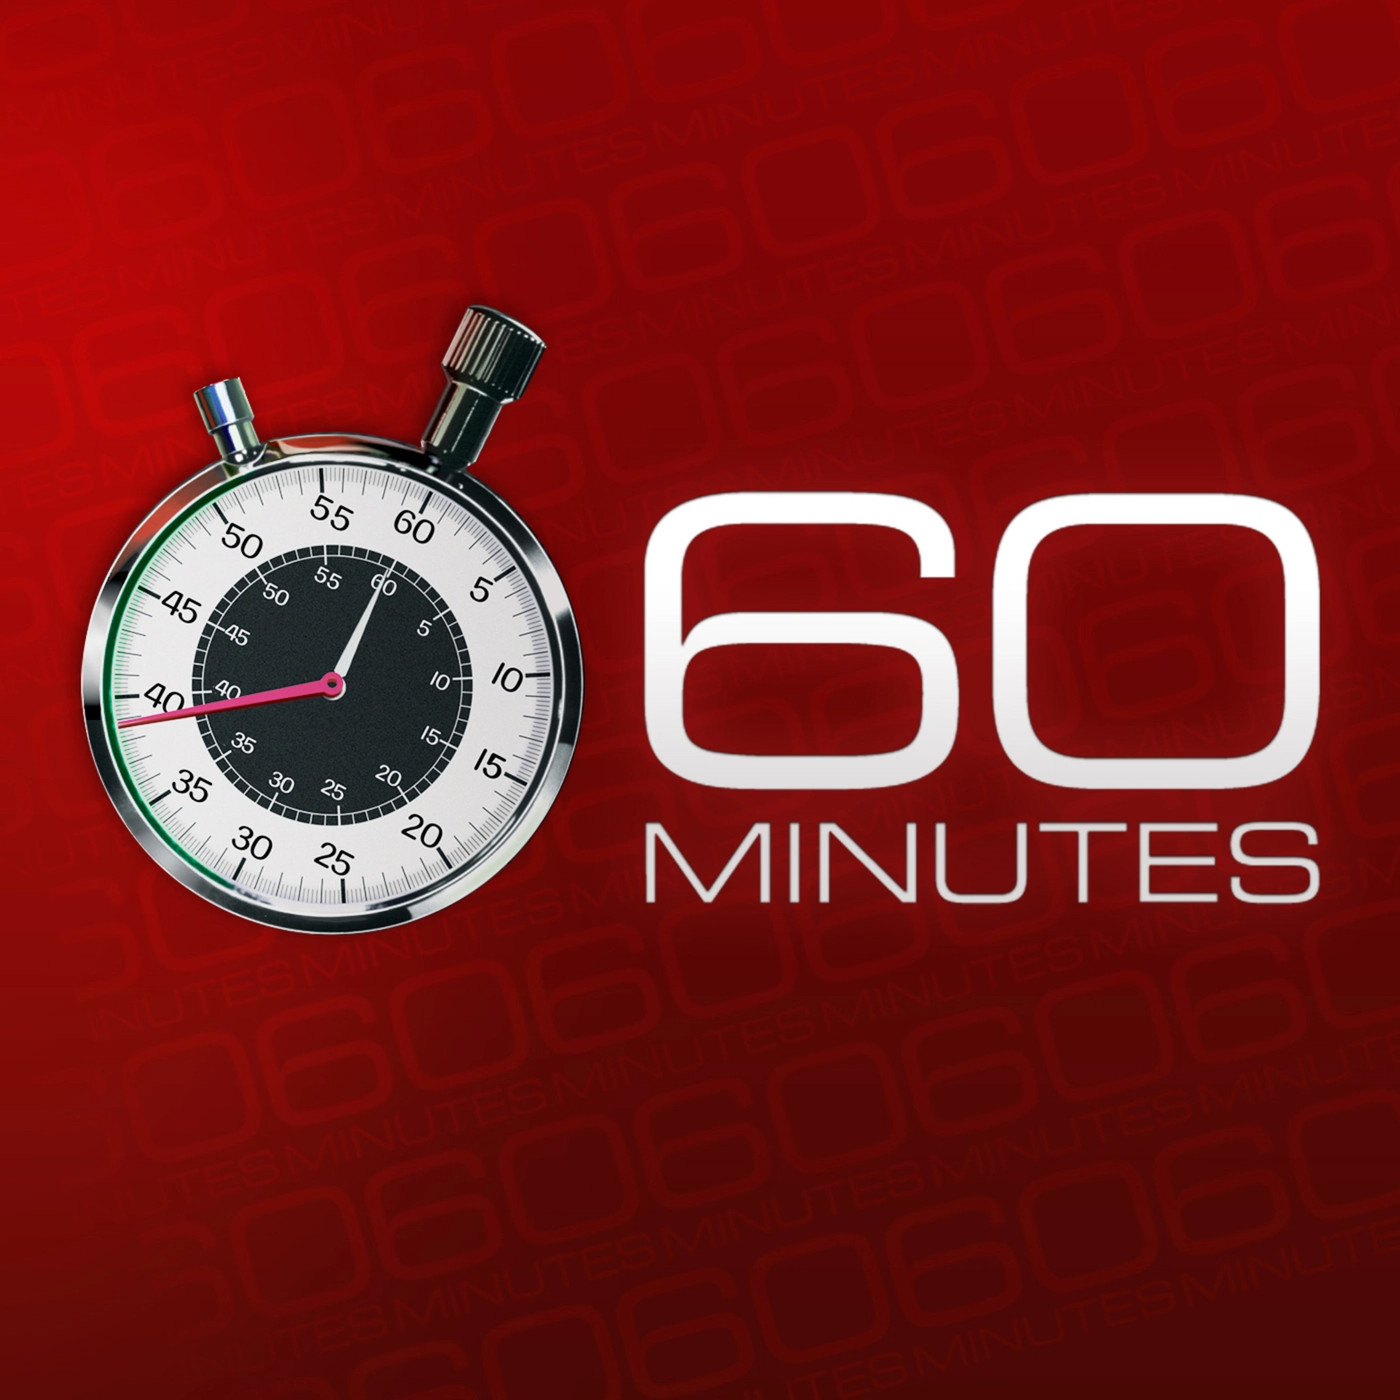 60 Minutes 7.26.2020